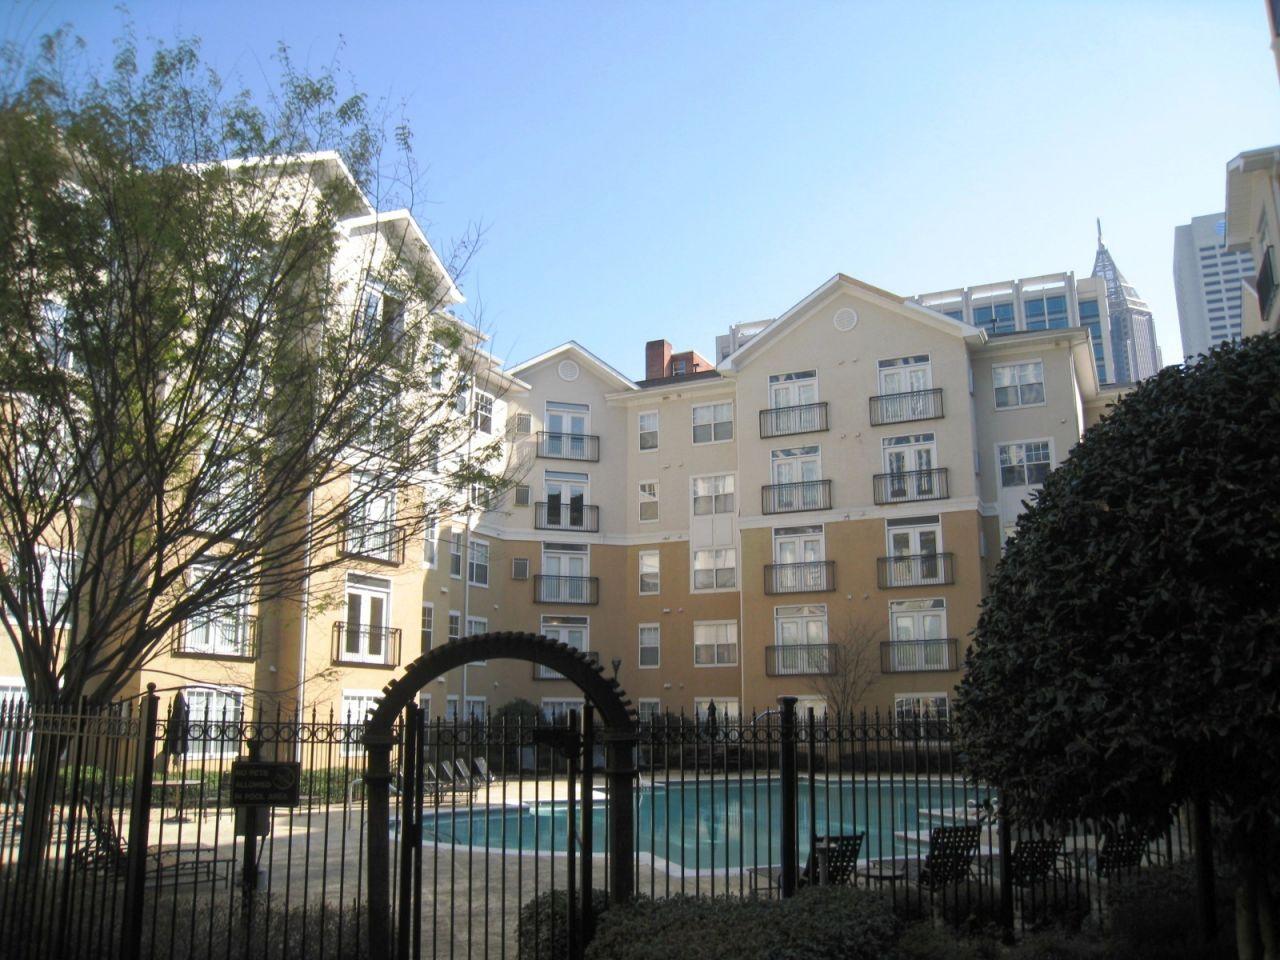 Georgia Tech Off Campus Housing Cornerstone Village